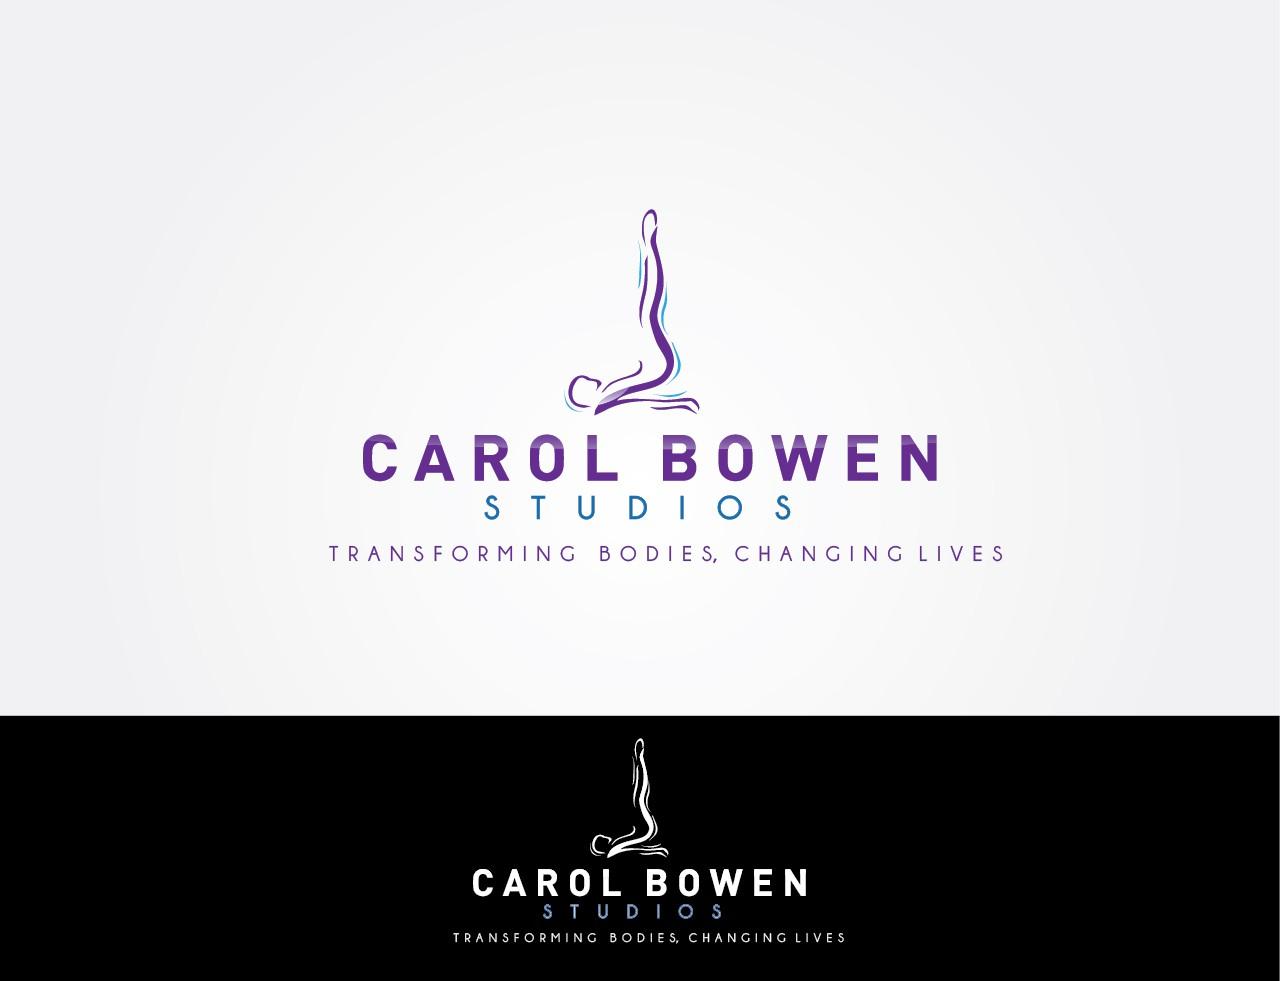 Help Carol Bowen Studios with a new logo